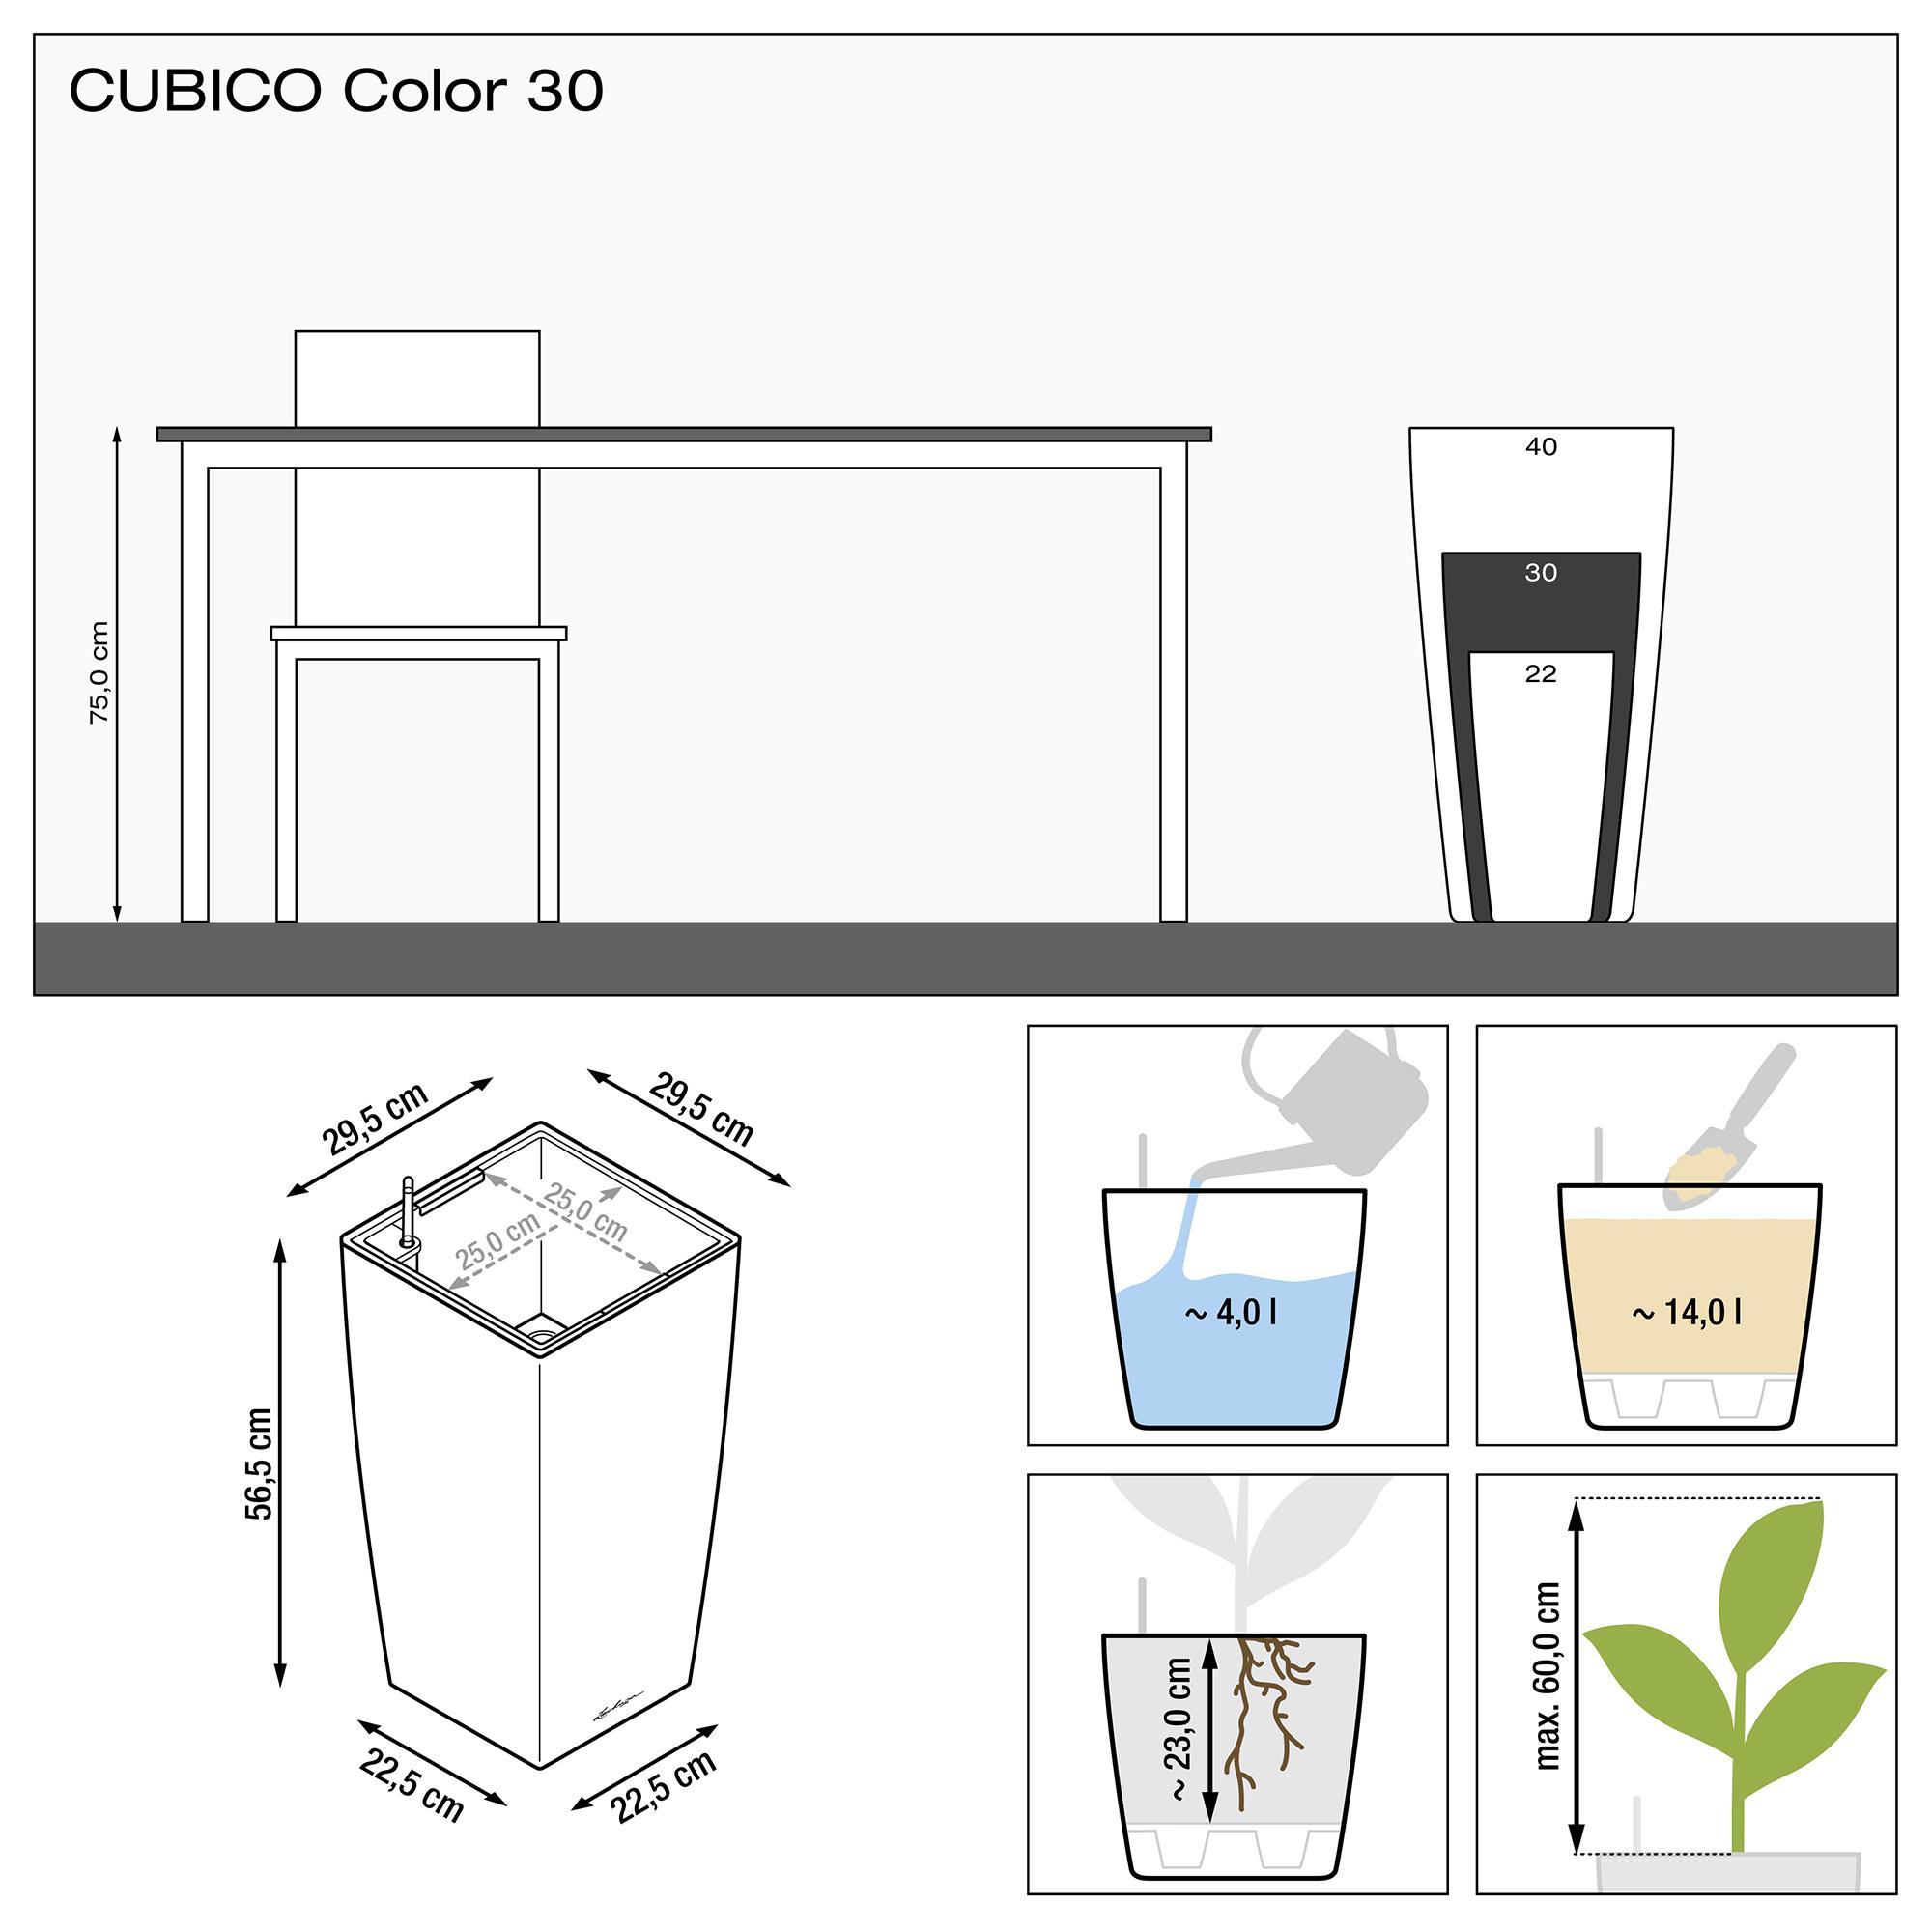 le_cubico-color30_product_addi_nz